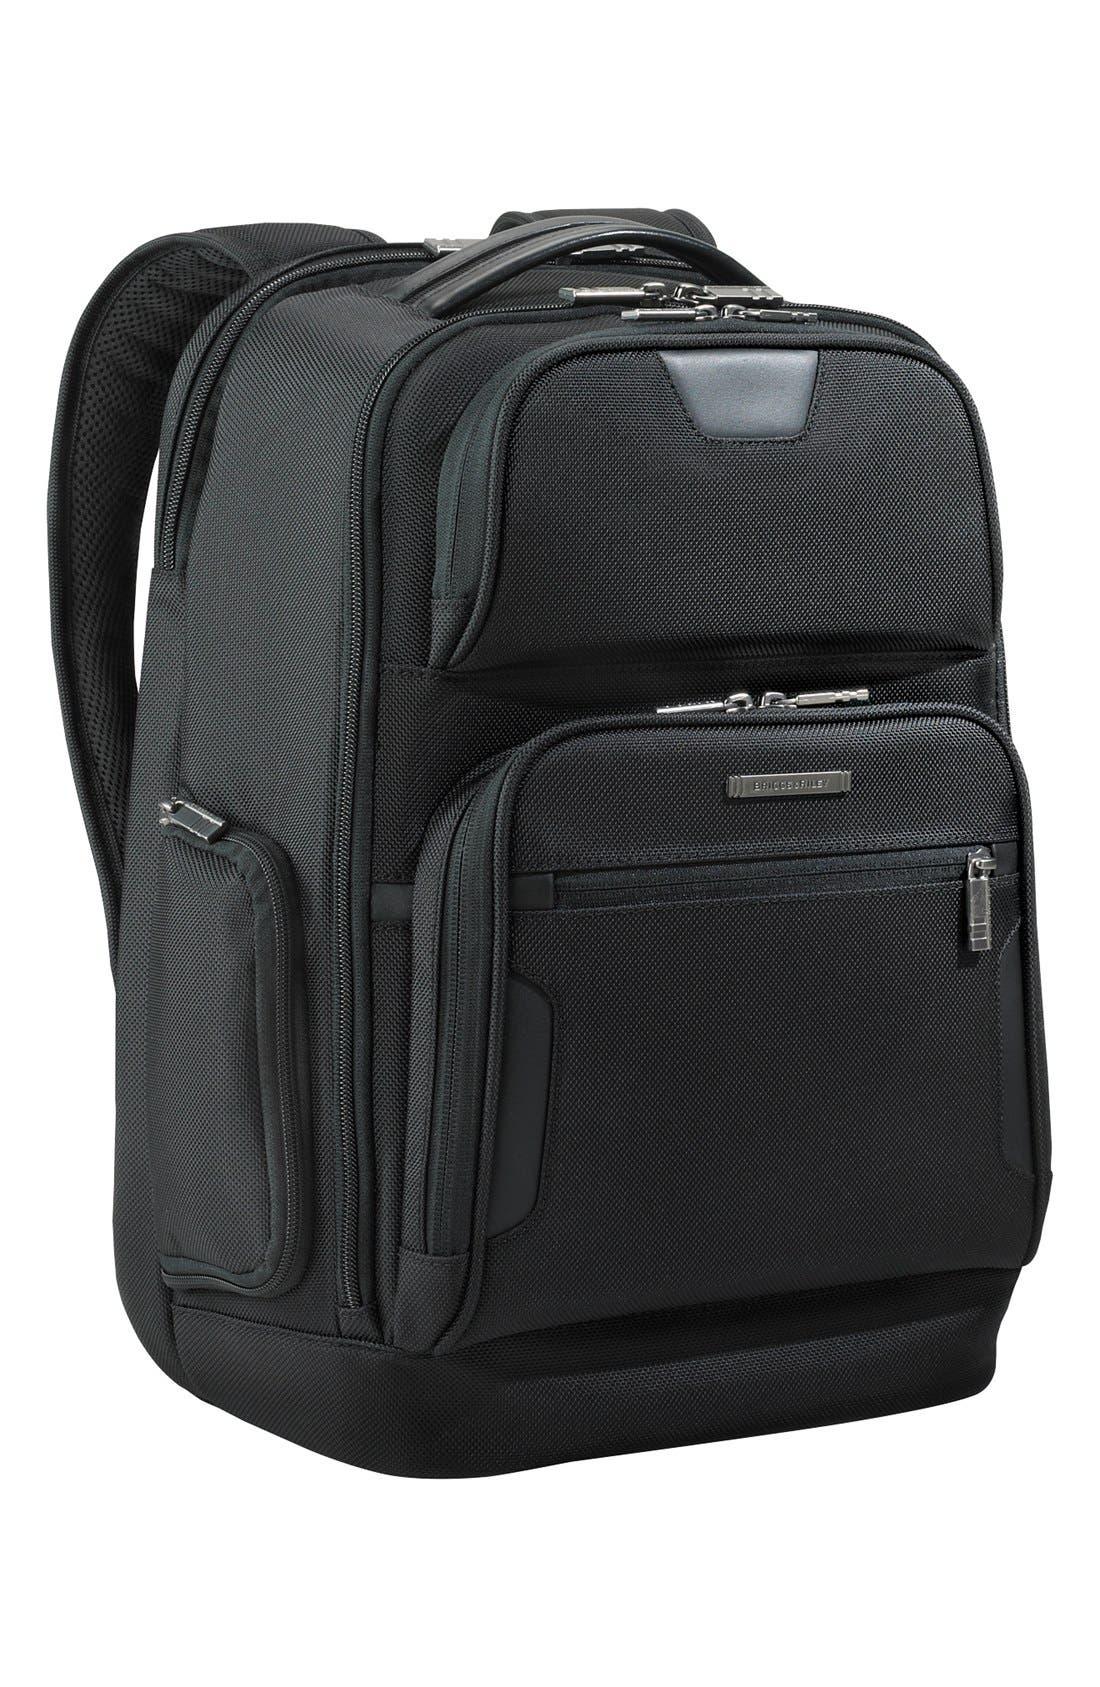 Main Image - Briggs & Riley 'Medium' Ballistic Nylon Backpack